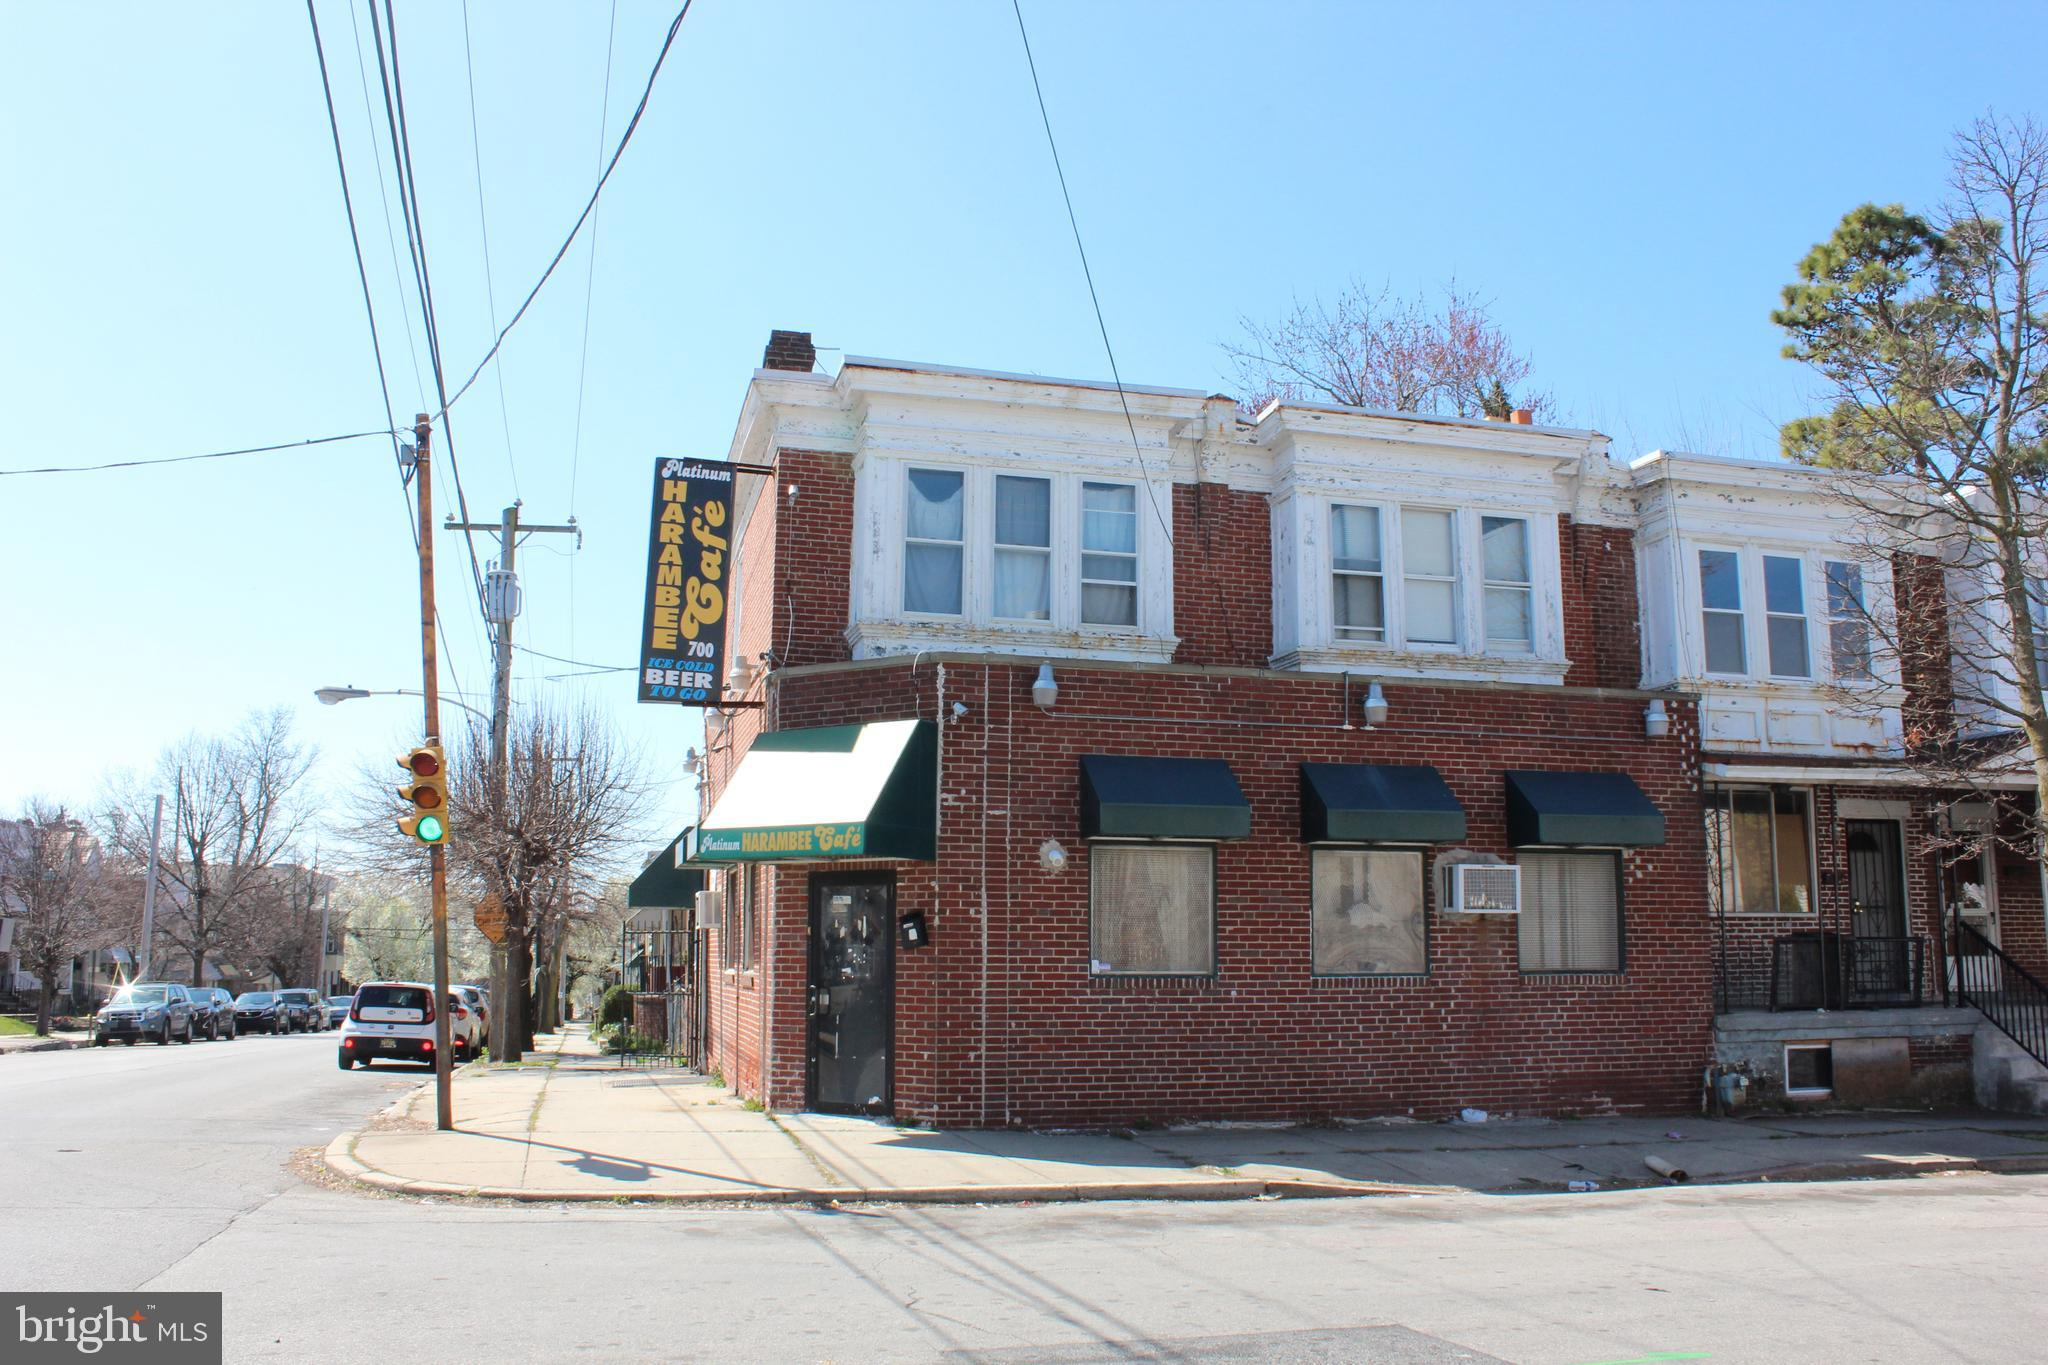 700 Lloyd Street, Chester, PA 19013